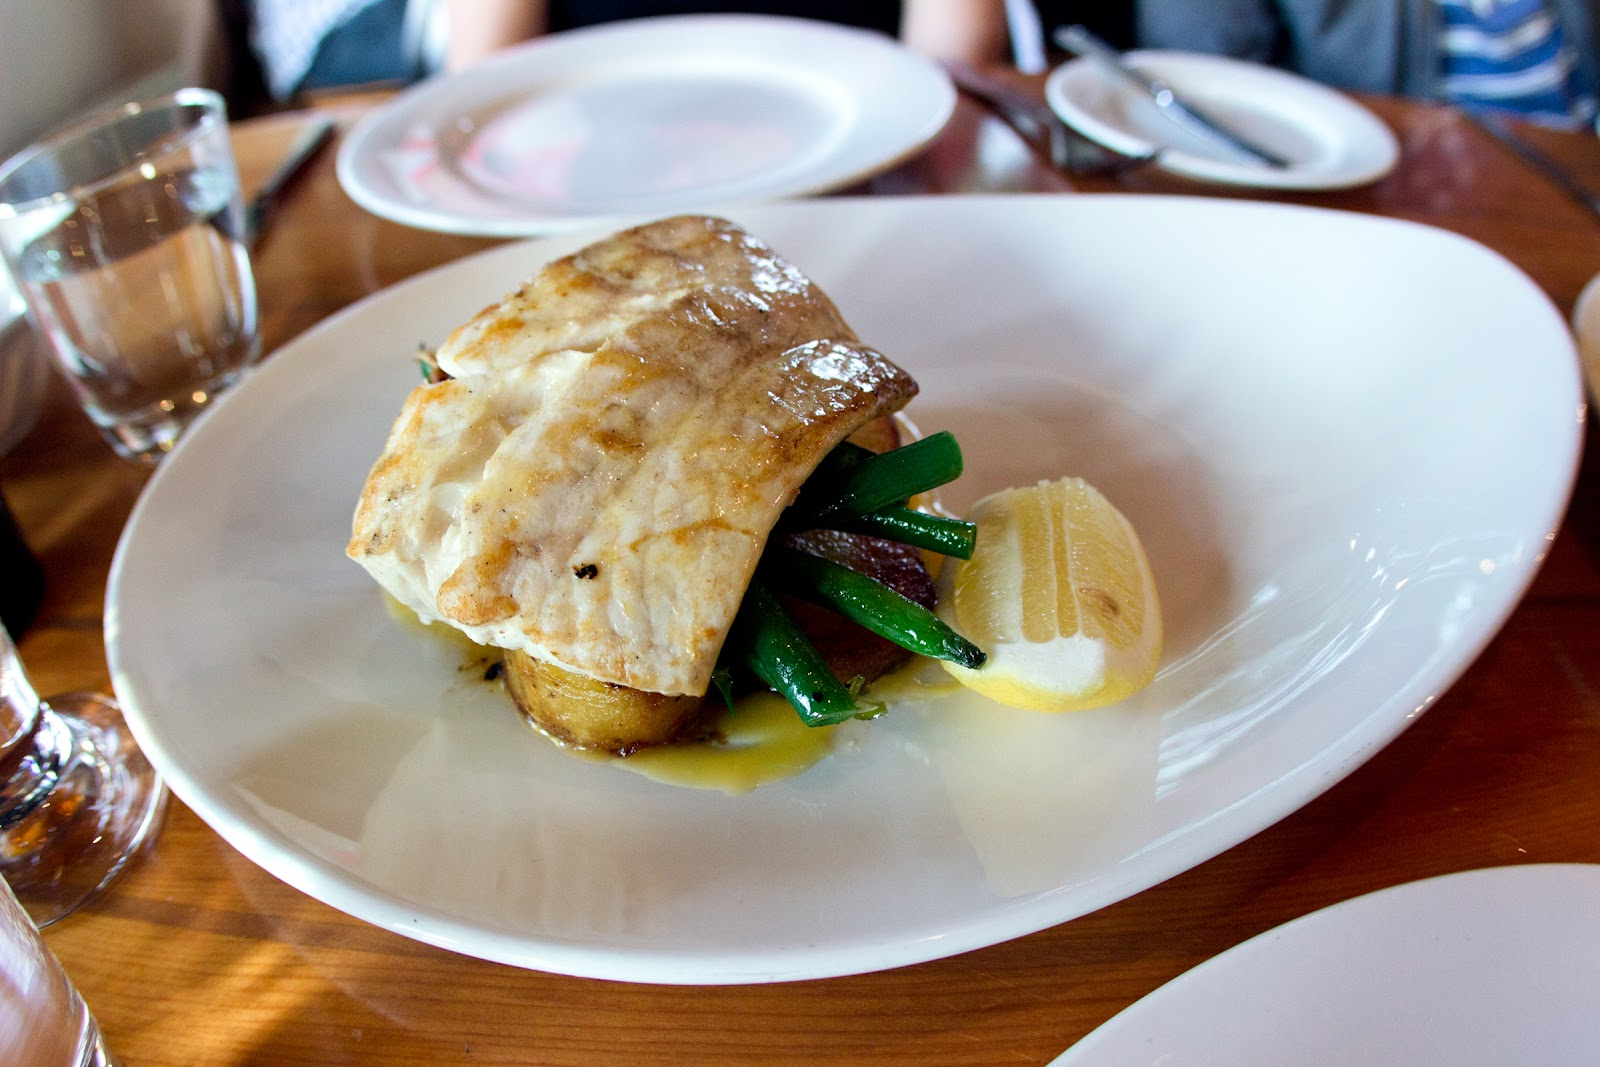 Hallam S Waterfront Seafood Restaurant